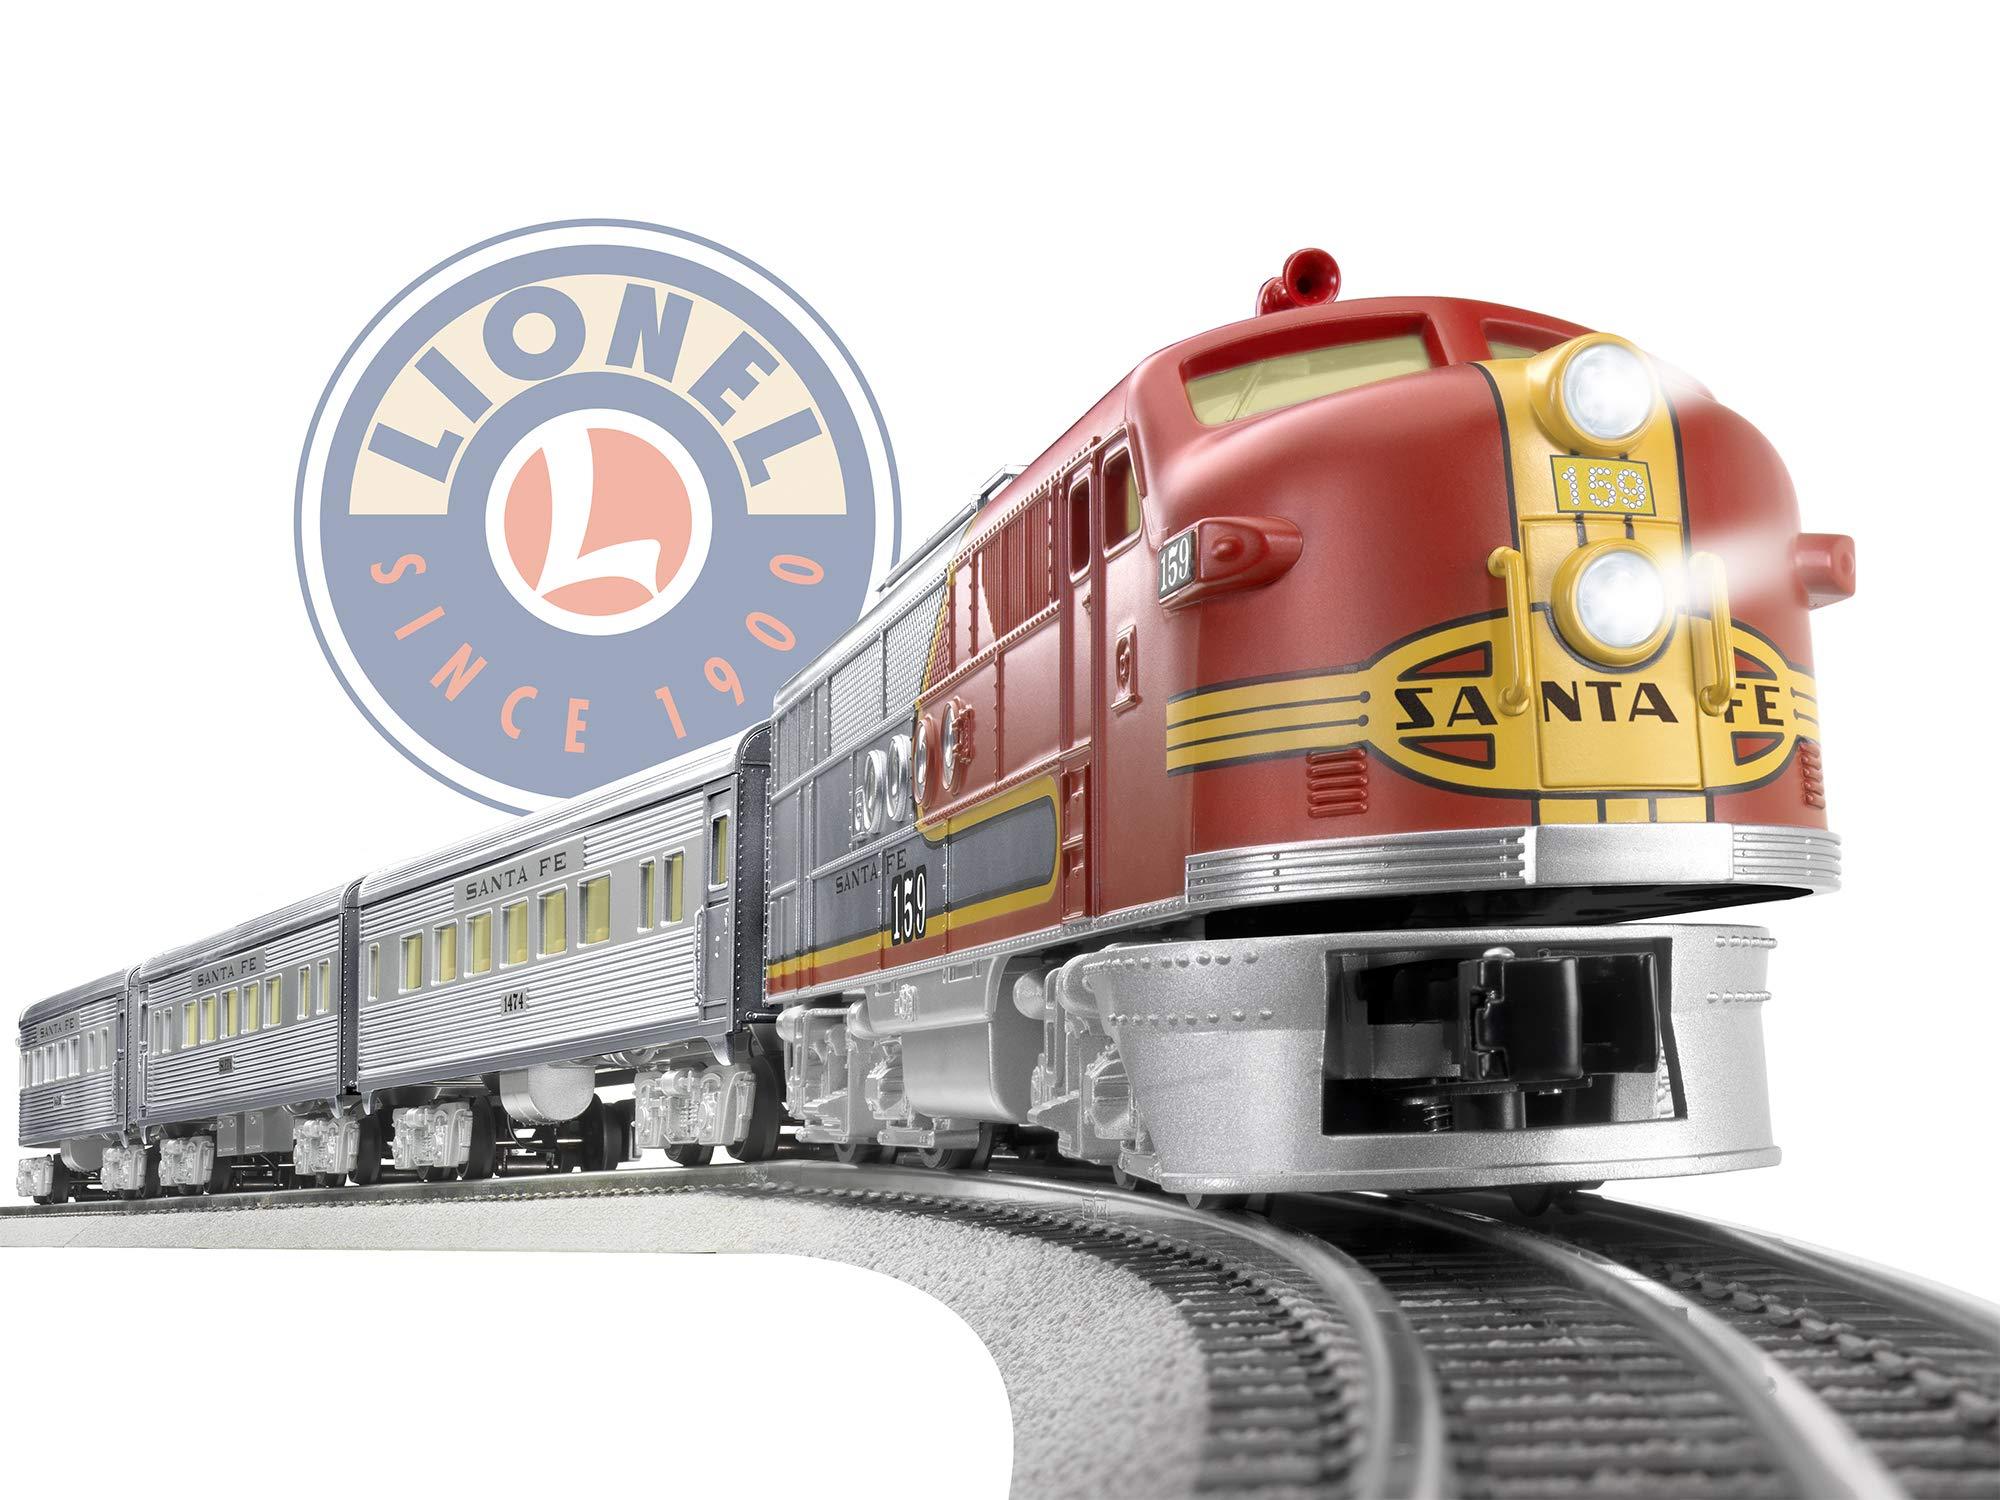 Lionel Santa Fe Super Chief Electric O Gauge Model Train Set w/ Remote and Bluetooth Capability by Lionel (Image #11)